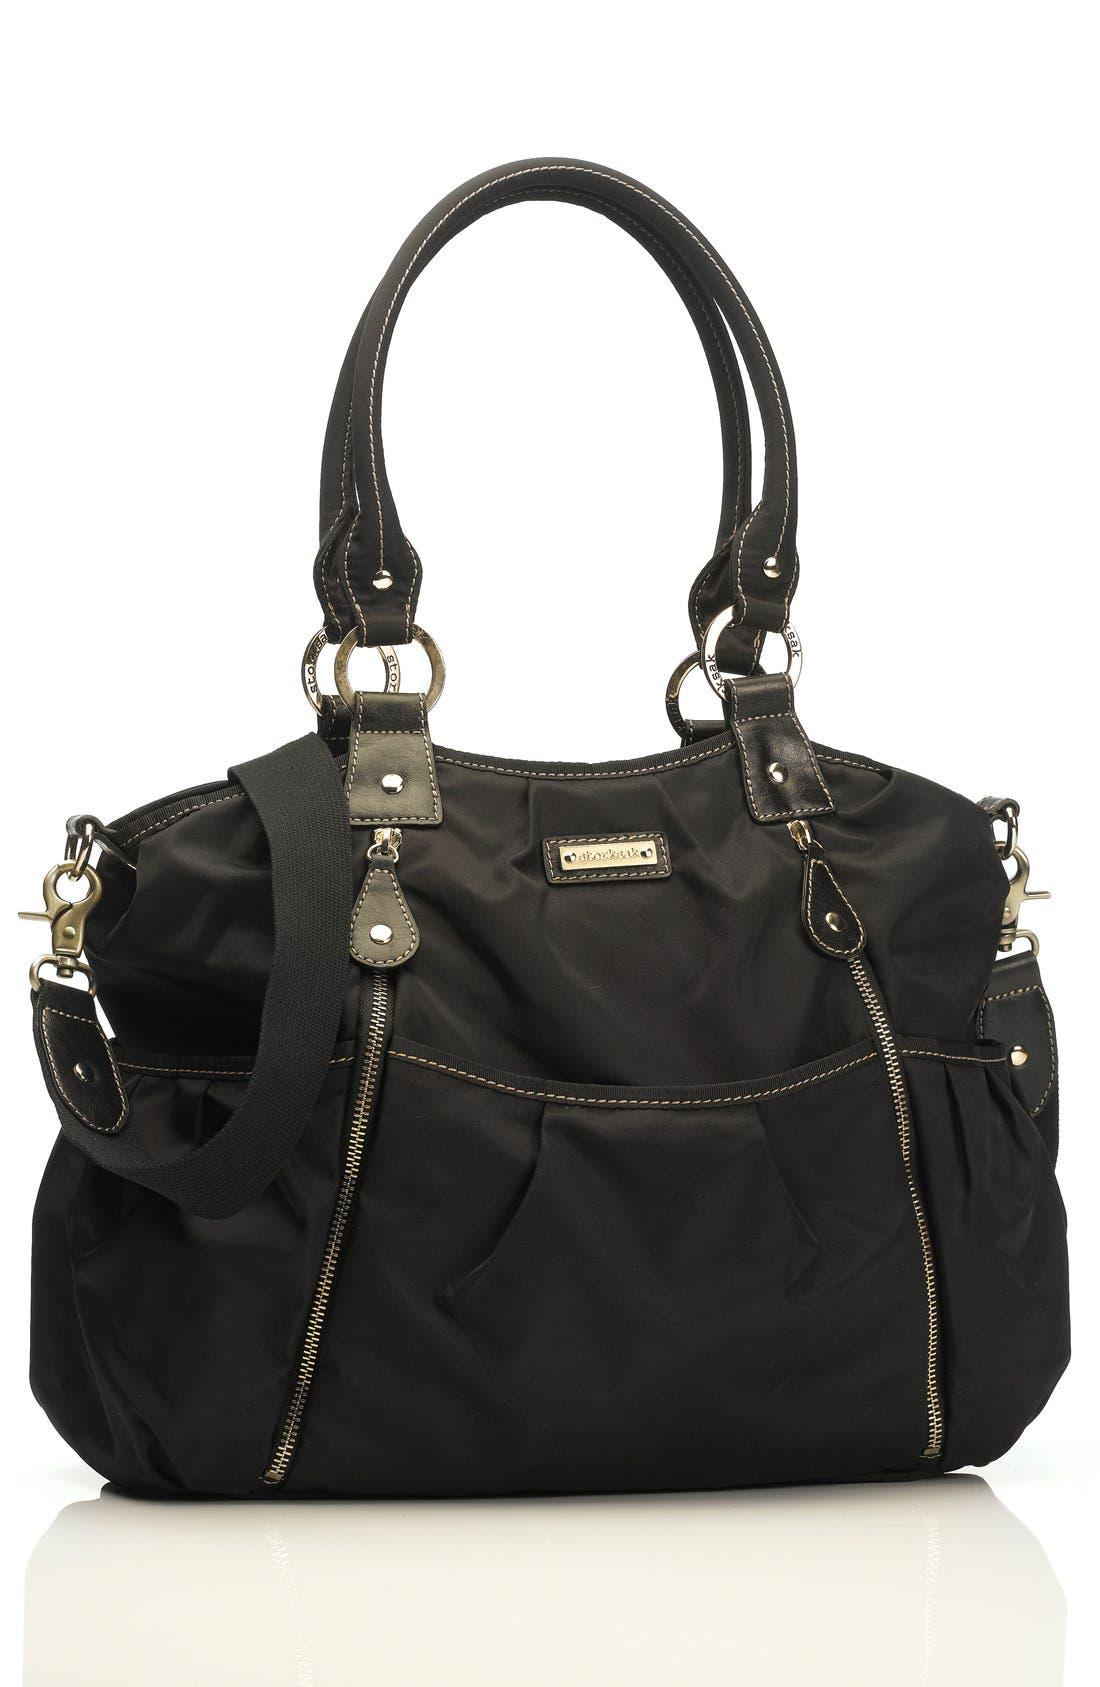 STORKSAK 'Olivia' Nylon Diaper Bag, Main, color, 001